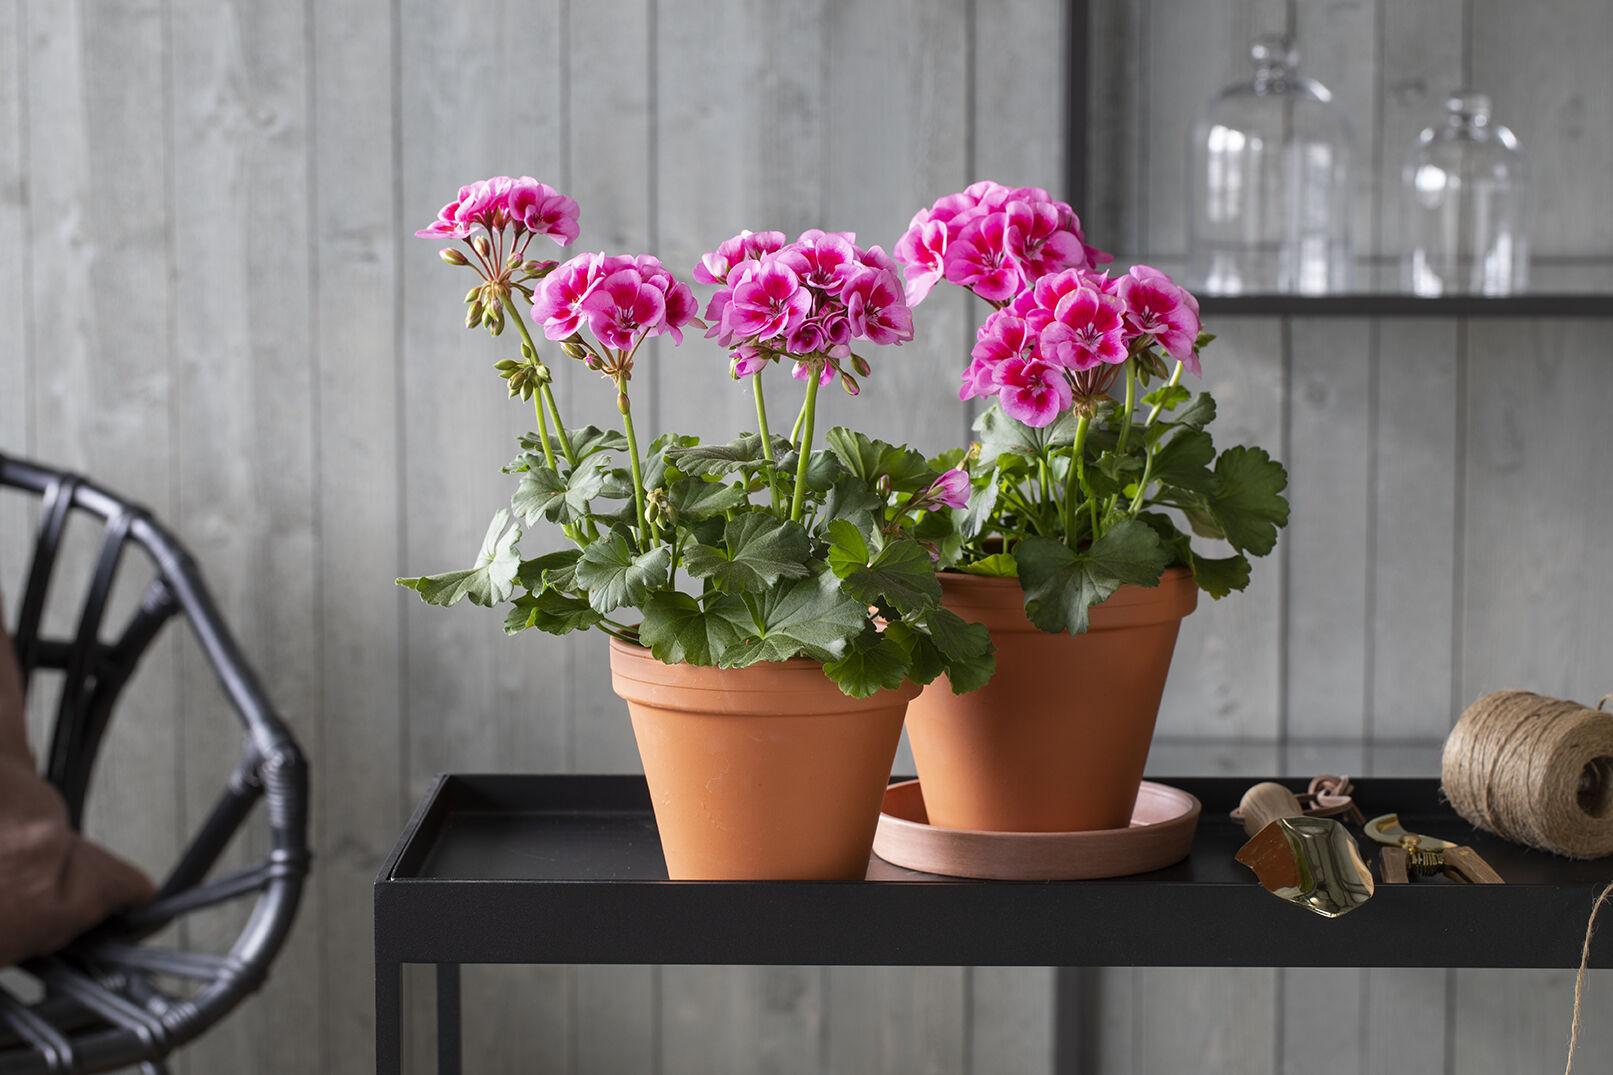 Rosa pelargonia i terrakottapotter